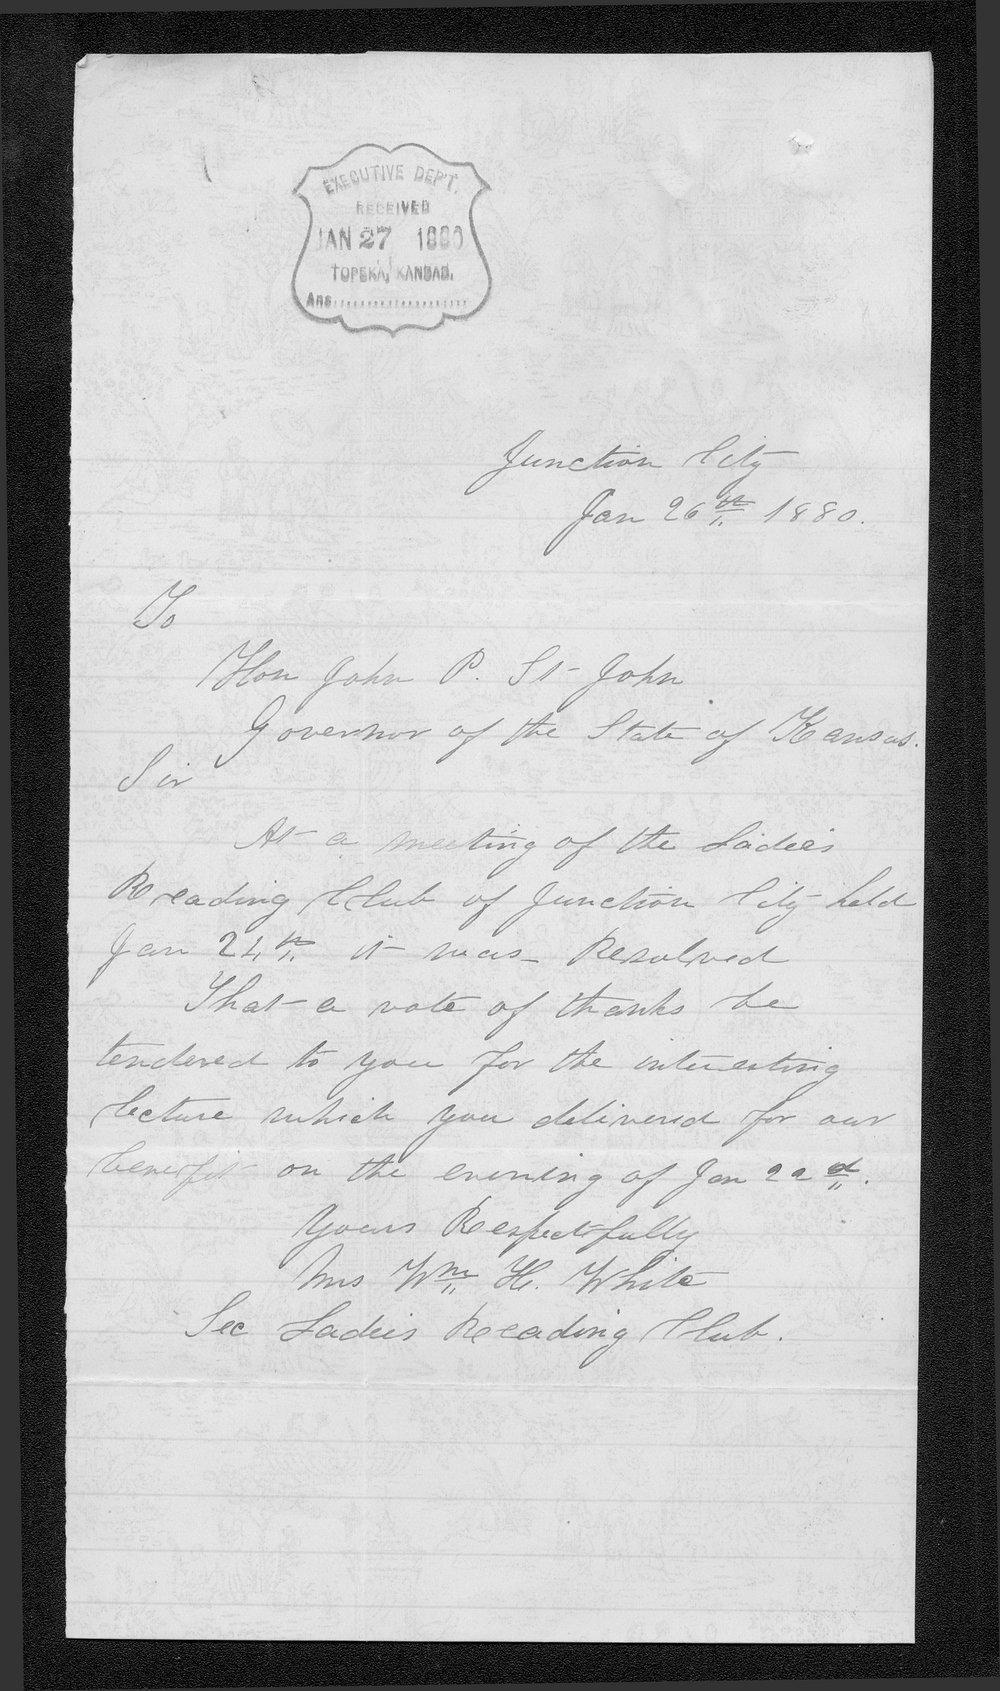 Mrs. W.H. White to Governor John St. John